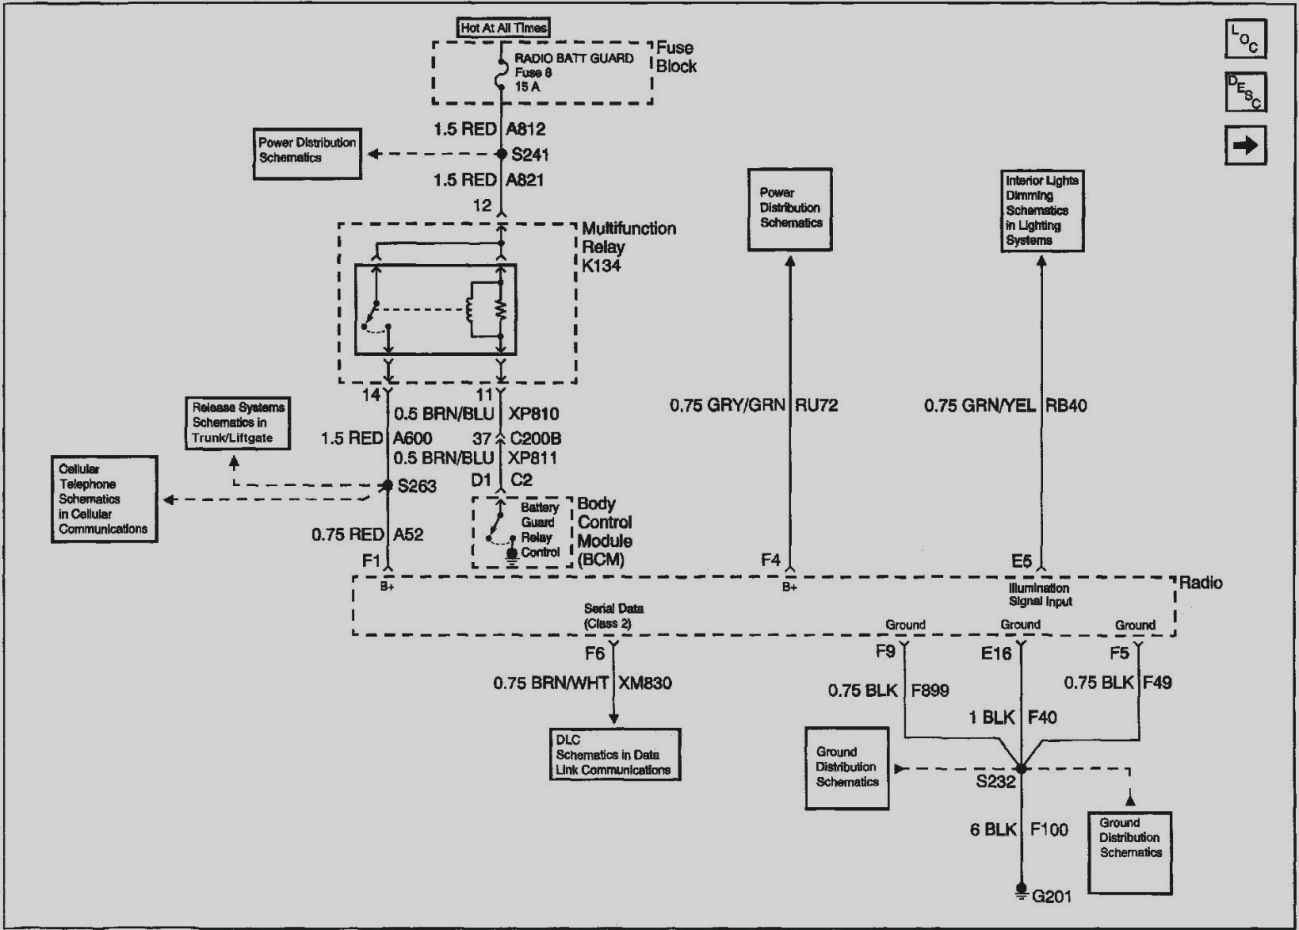 fuse diagram 2002 dts we 2175  2002 cadillac deville fuse diagram schematic wiring  cadillac deville fuse diagram schematic